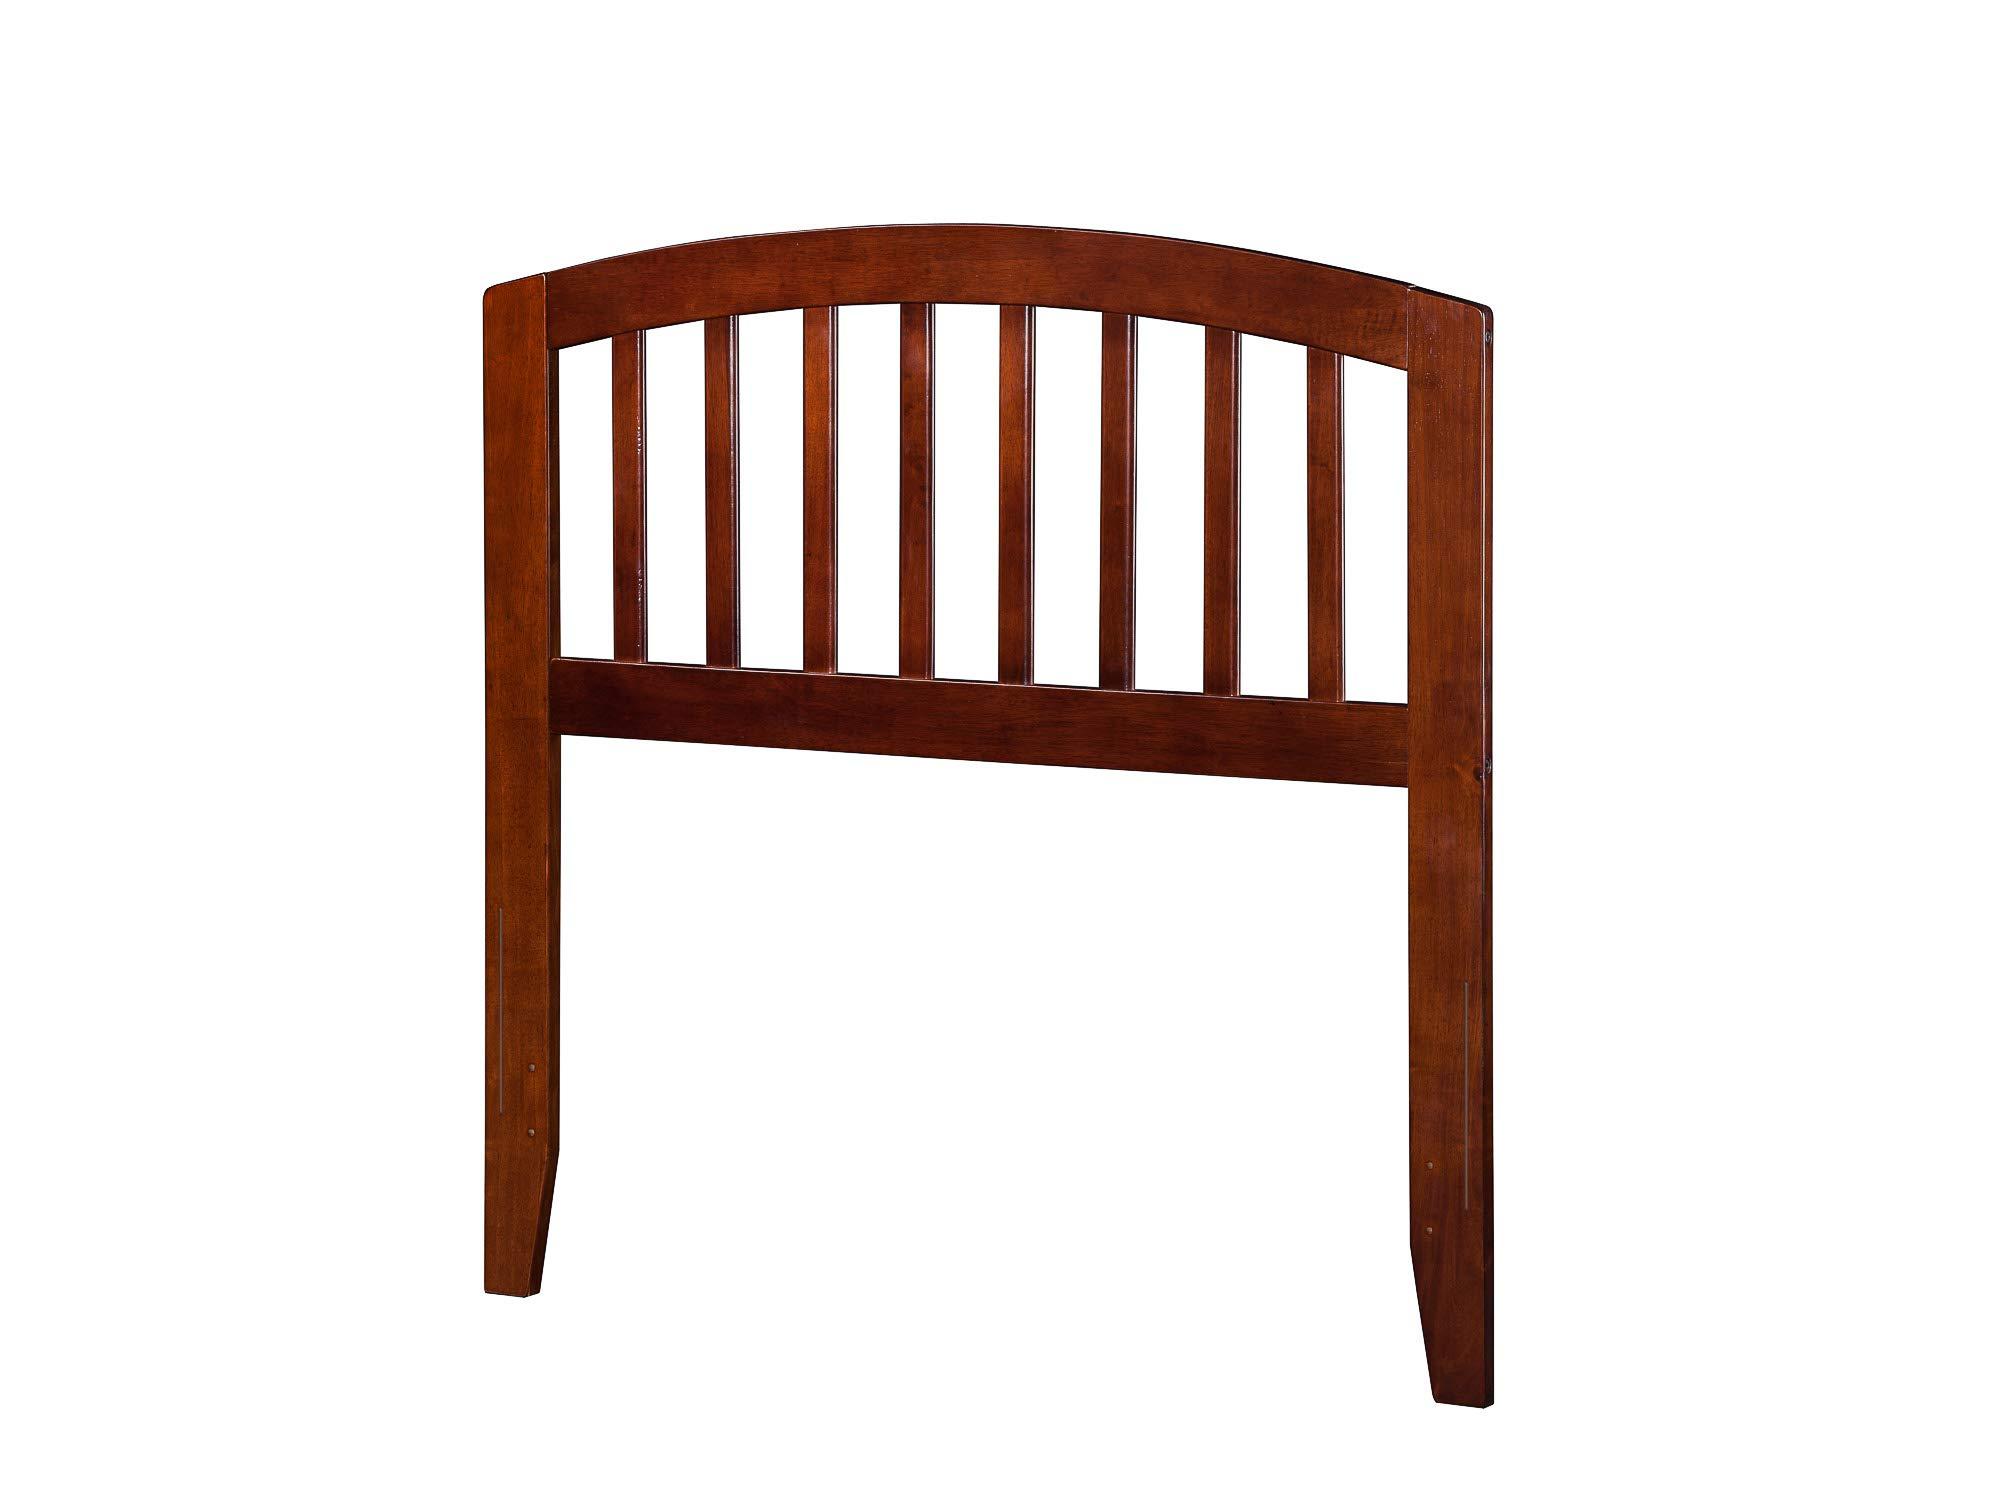 Atlantic Furniture AR288824 Richmond Headboard, Twin, Walnut by Atlantic Furniture